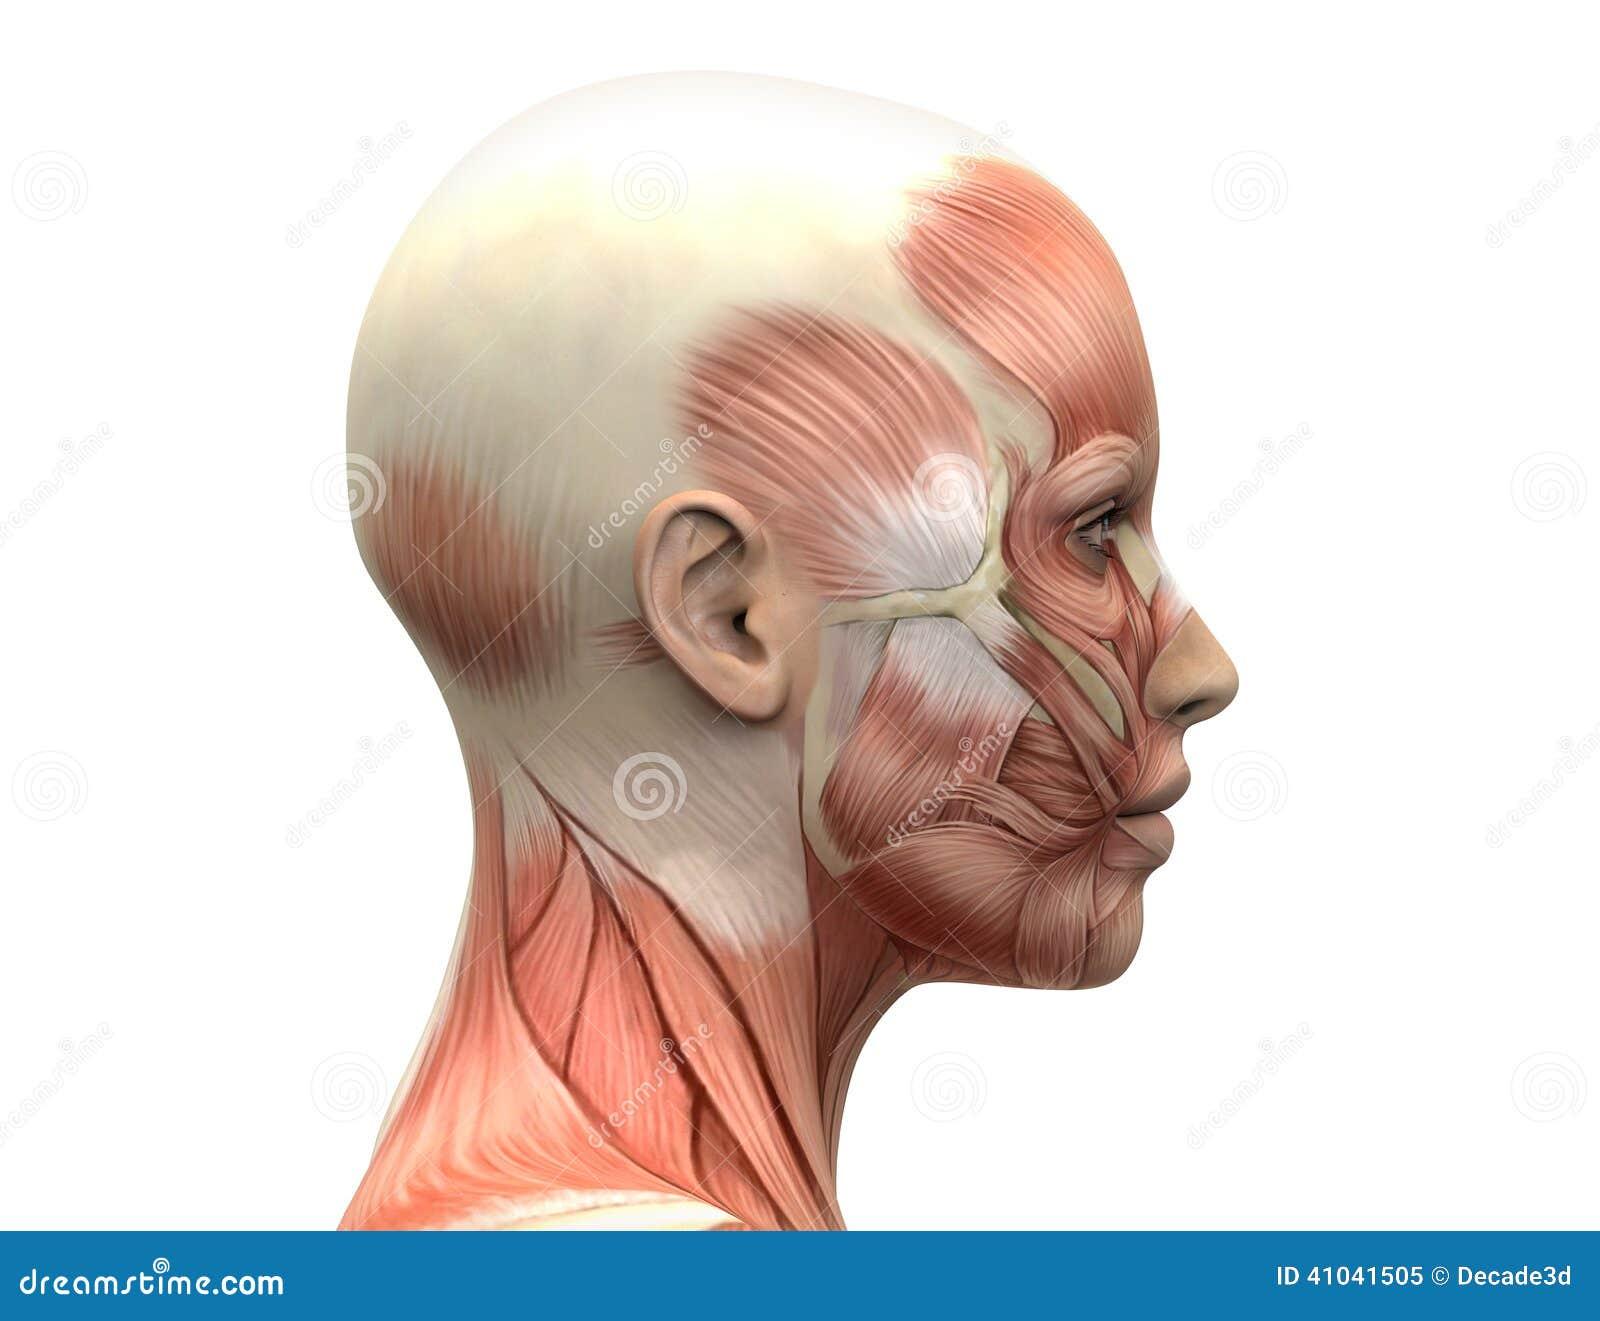 Human Side Face Anatomy Female Head Muscles Anatomy